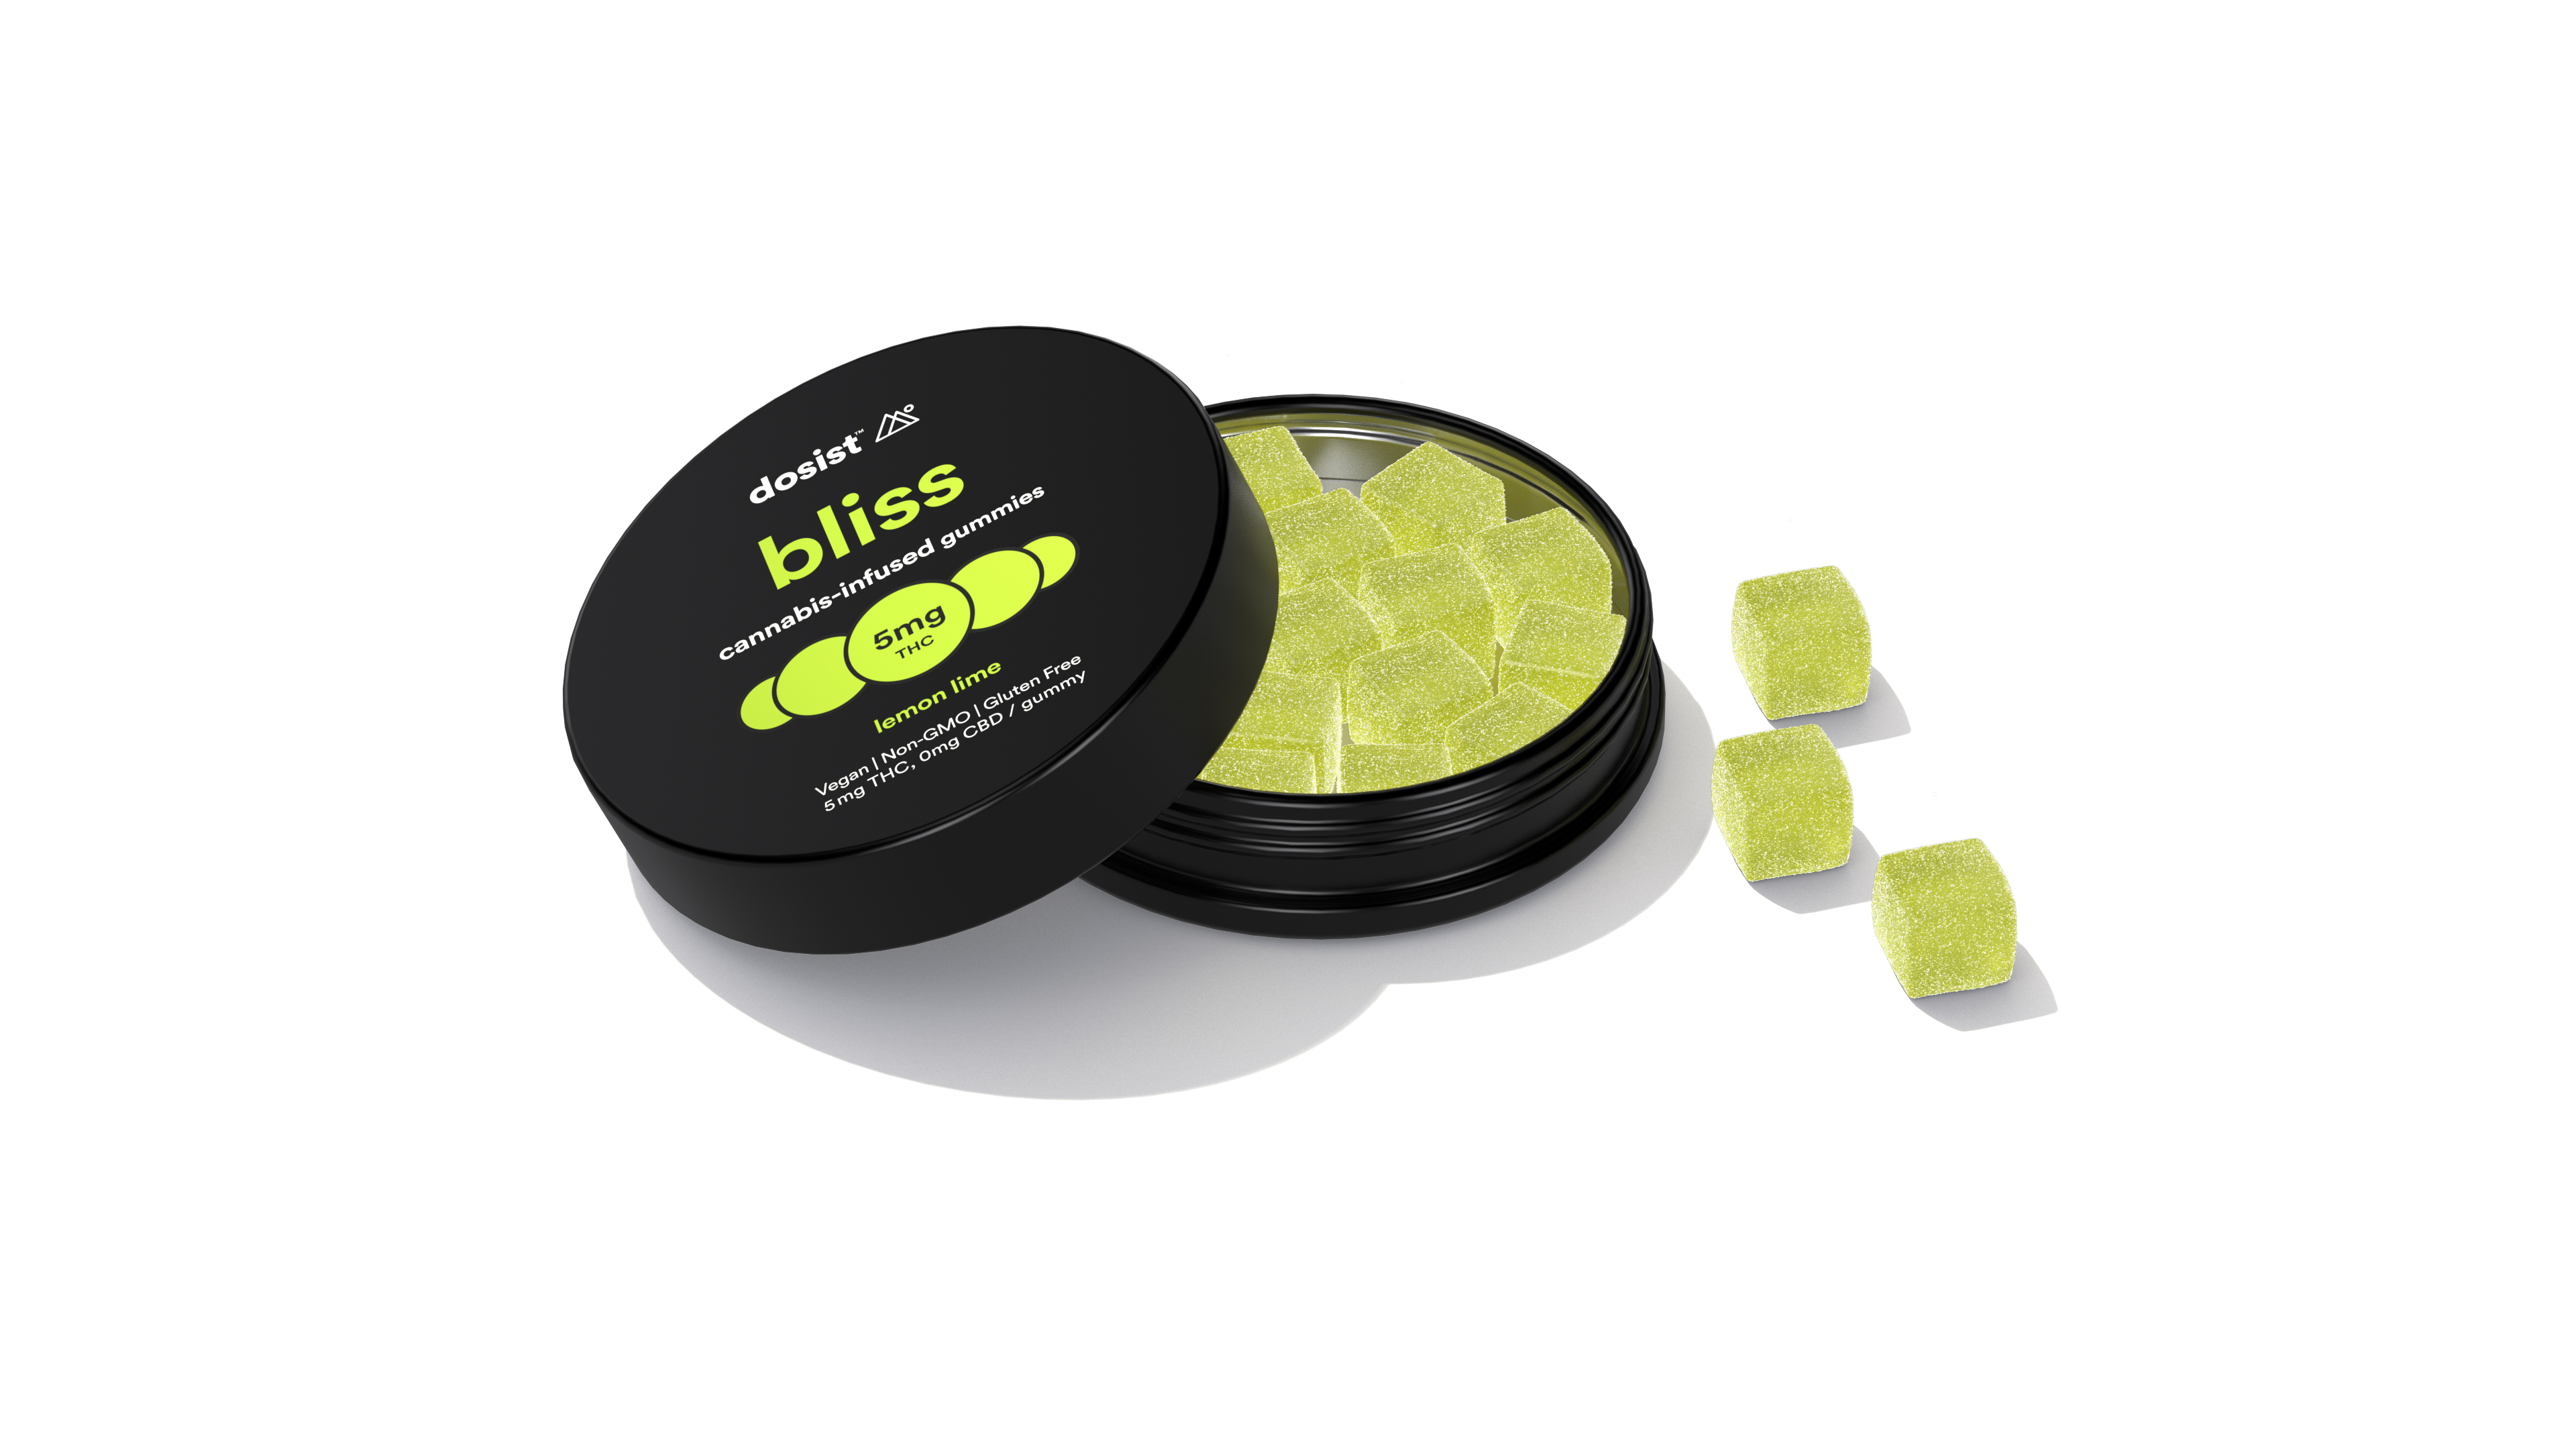 Dosist -Bliss - Gummies